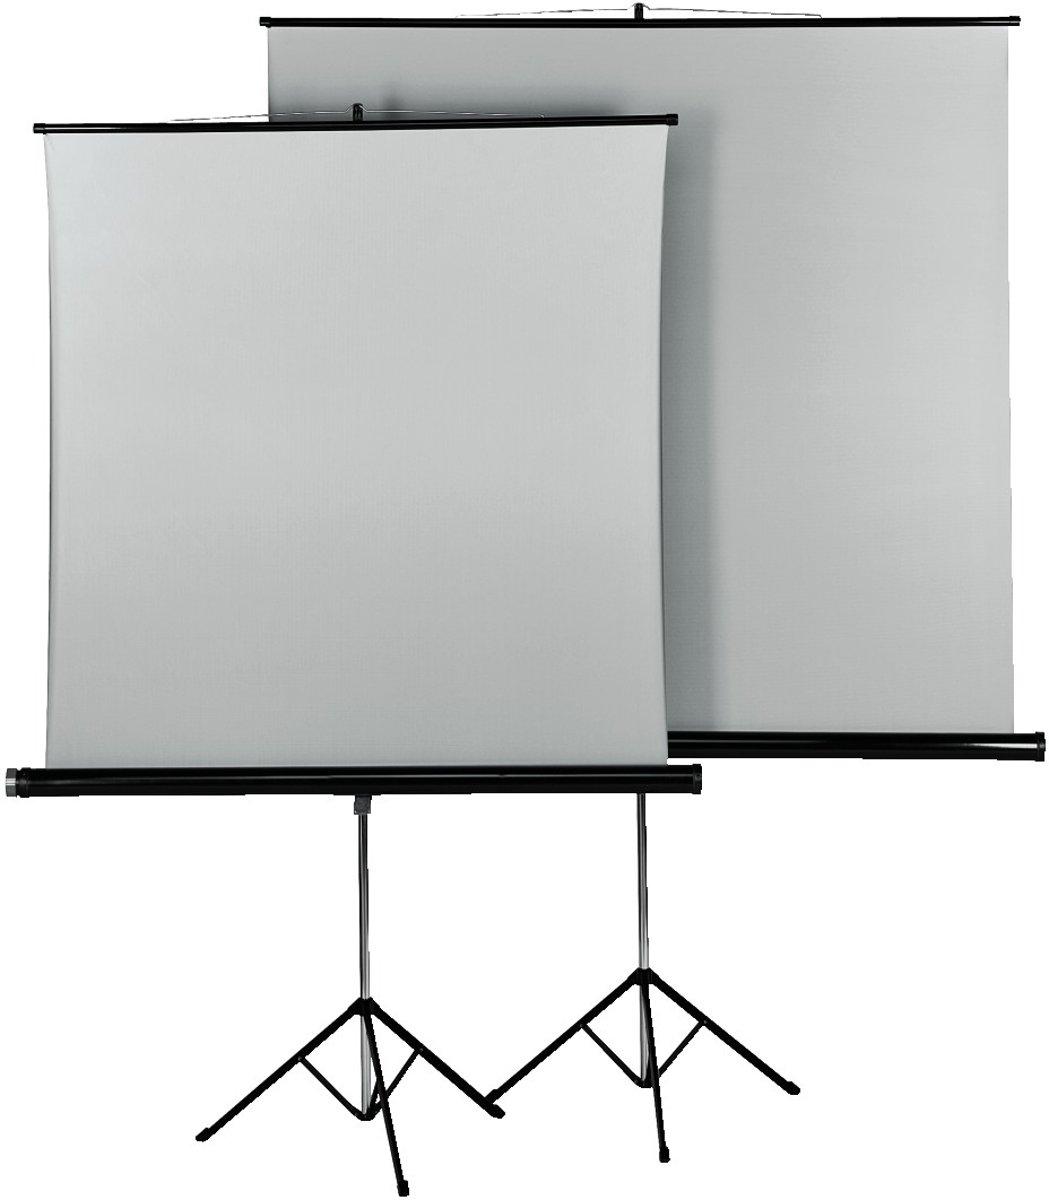 Hama Tripod Projectiescherm, 125 x 125cm, Duo kopen